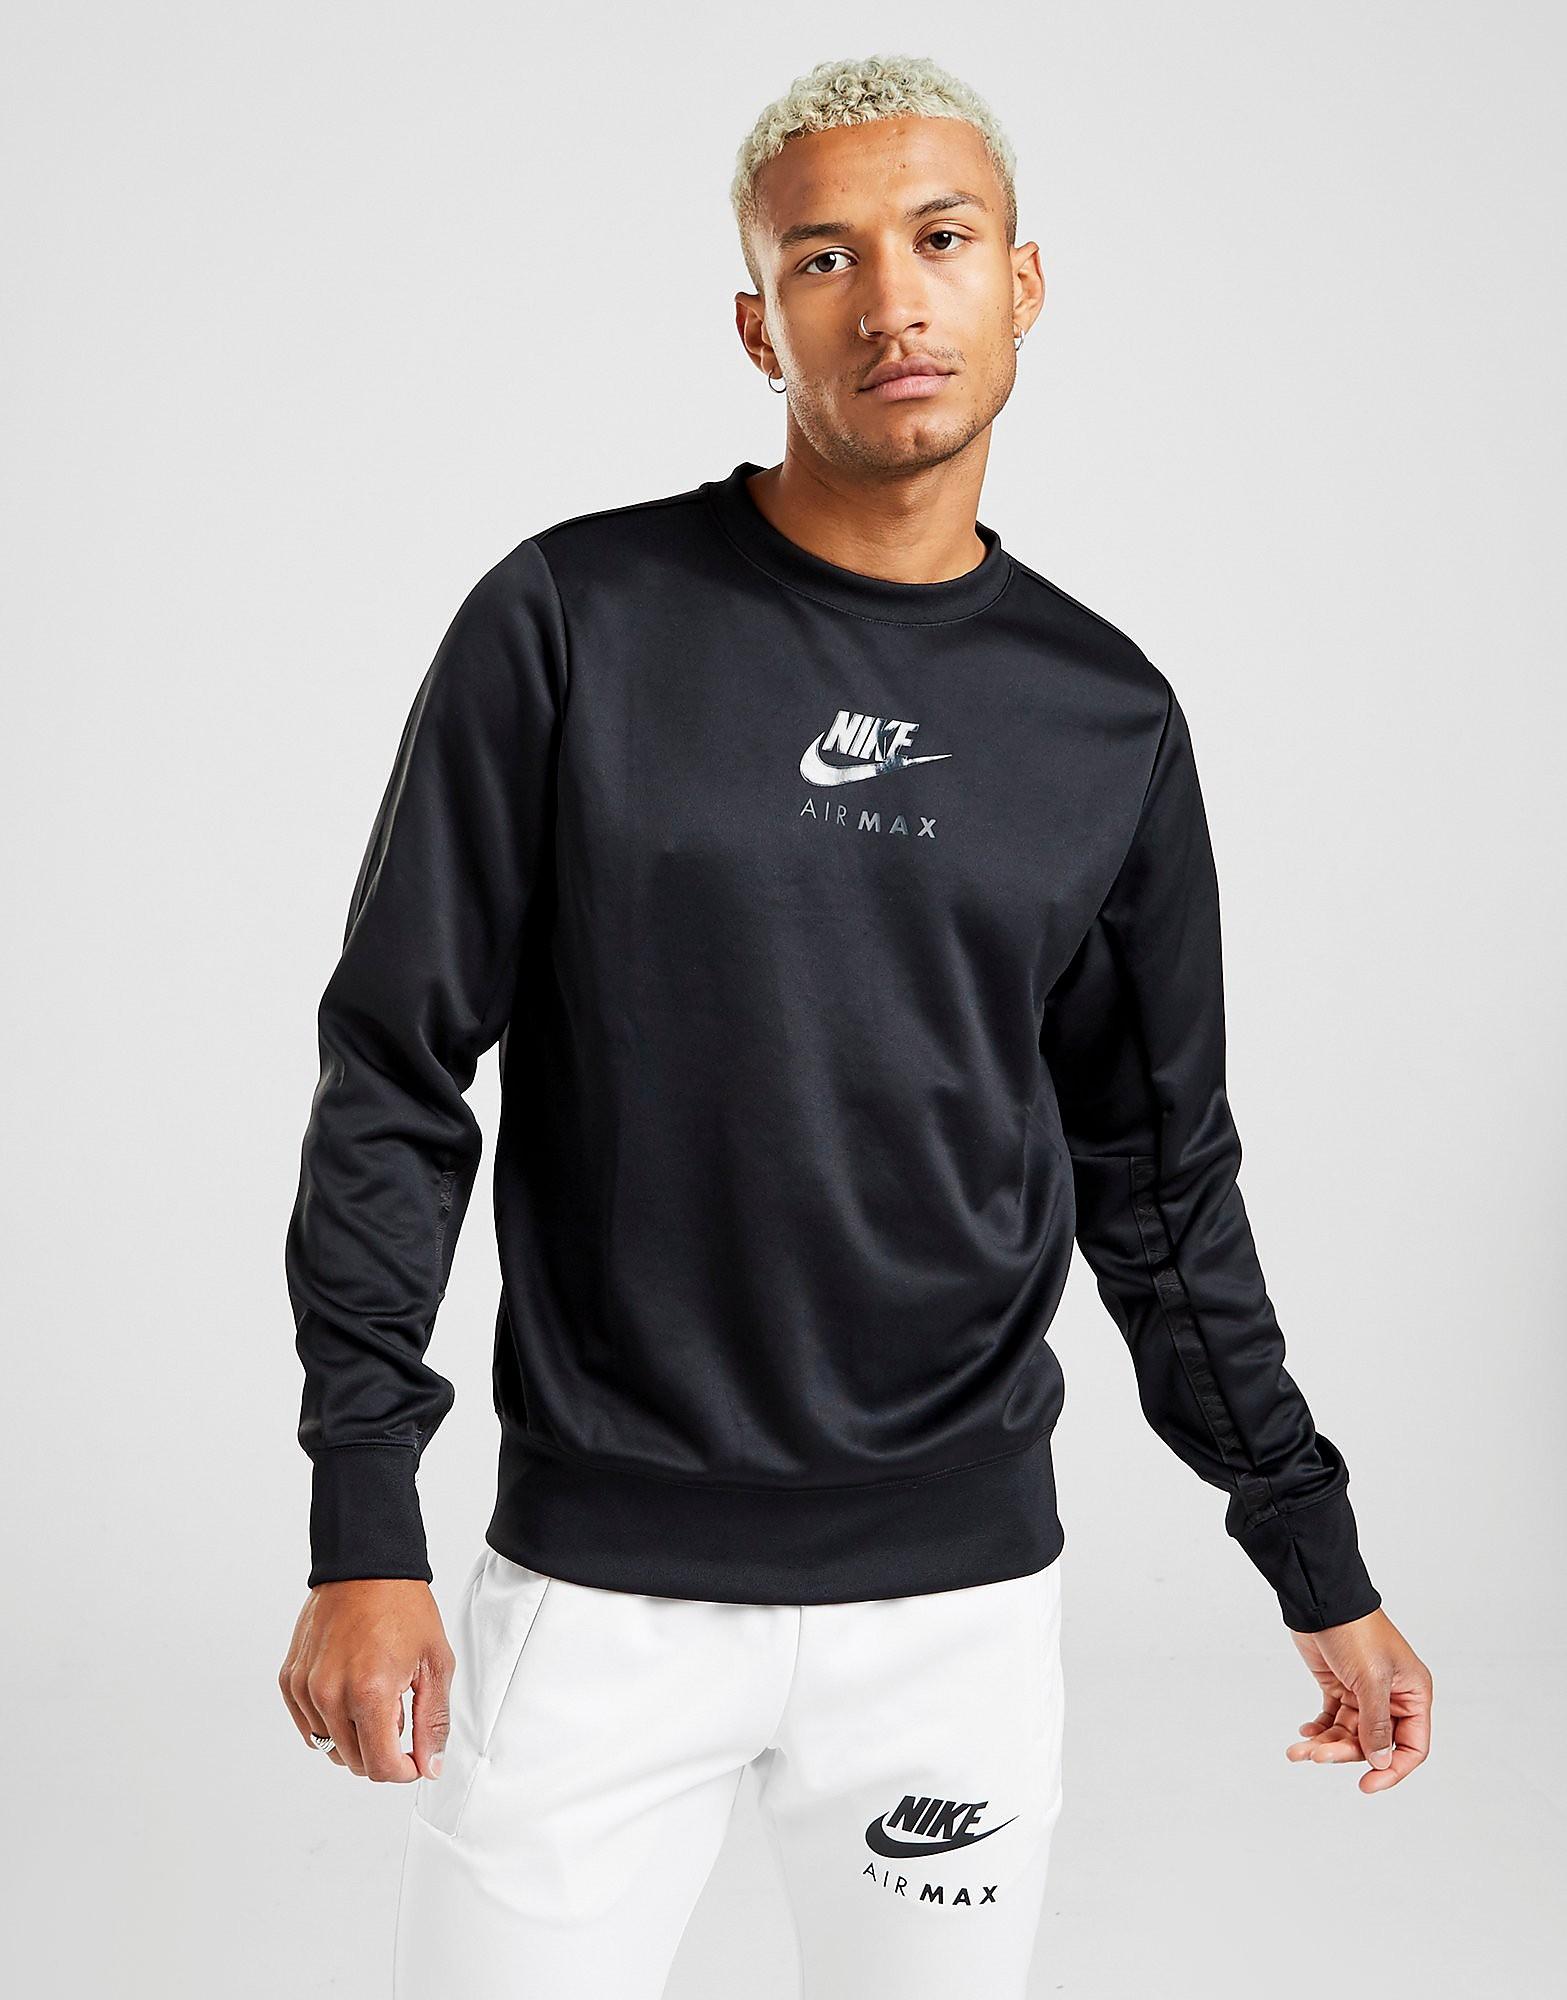 Nike Air Max Crew Sweater